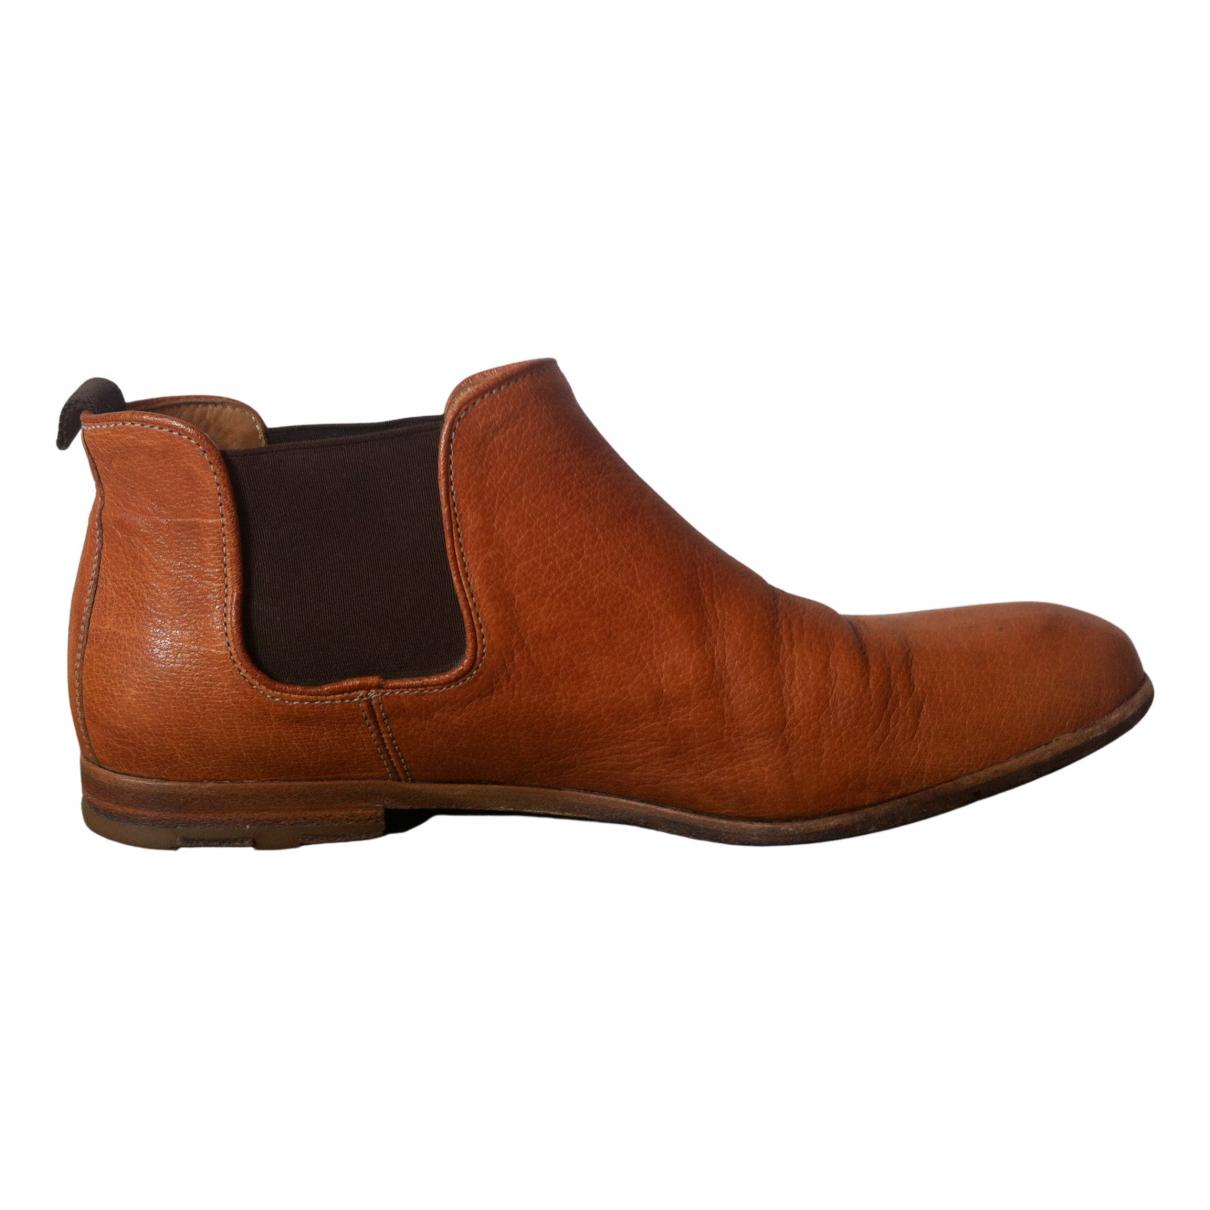 Heschung - Boots   pour femme en cuir - marron